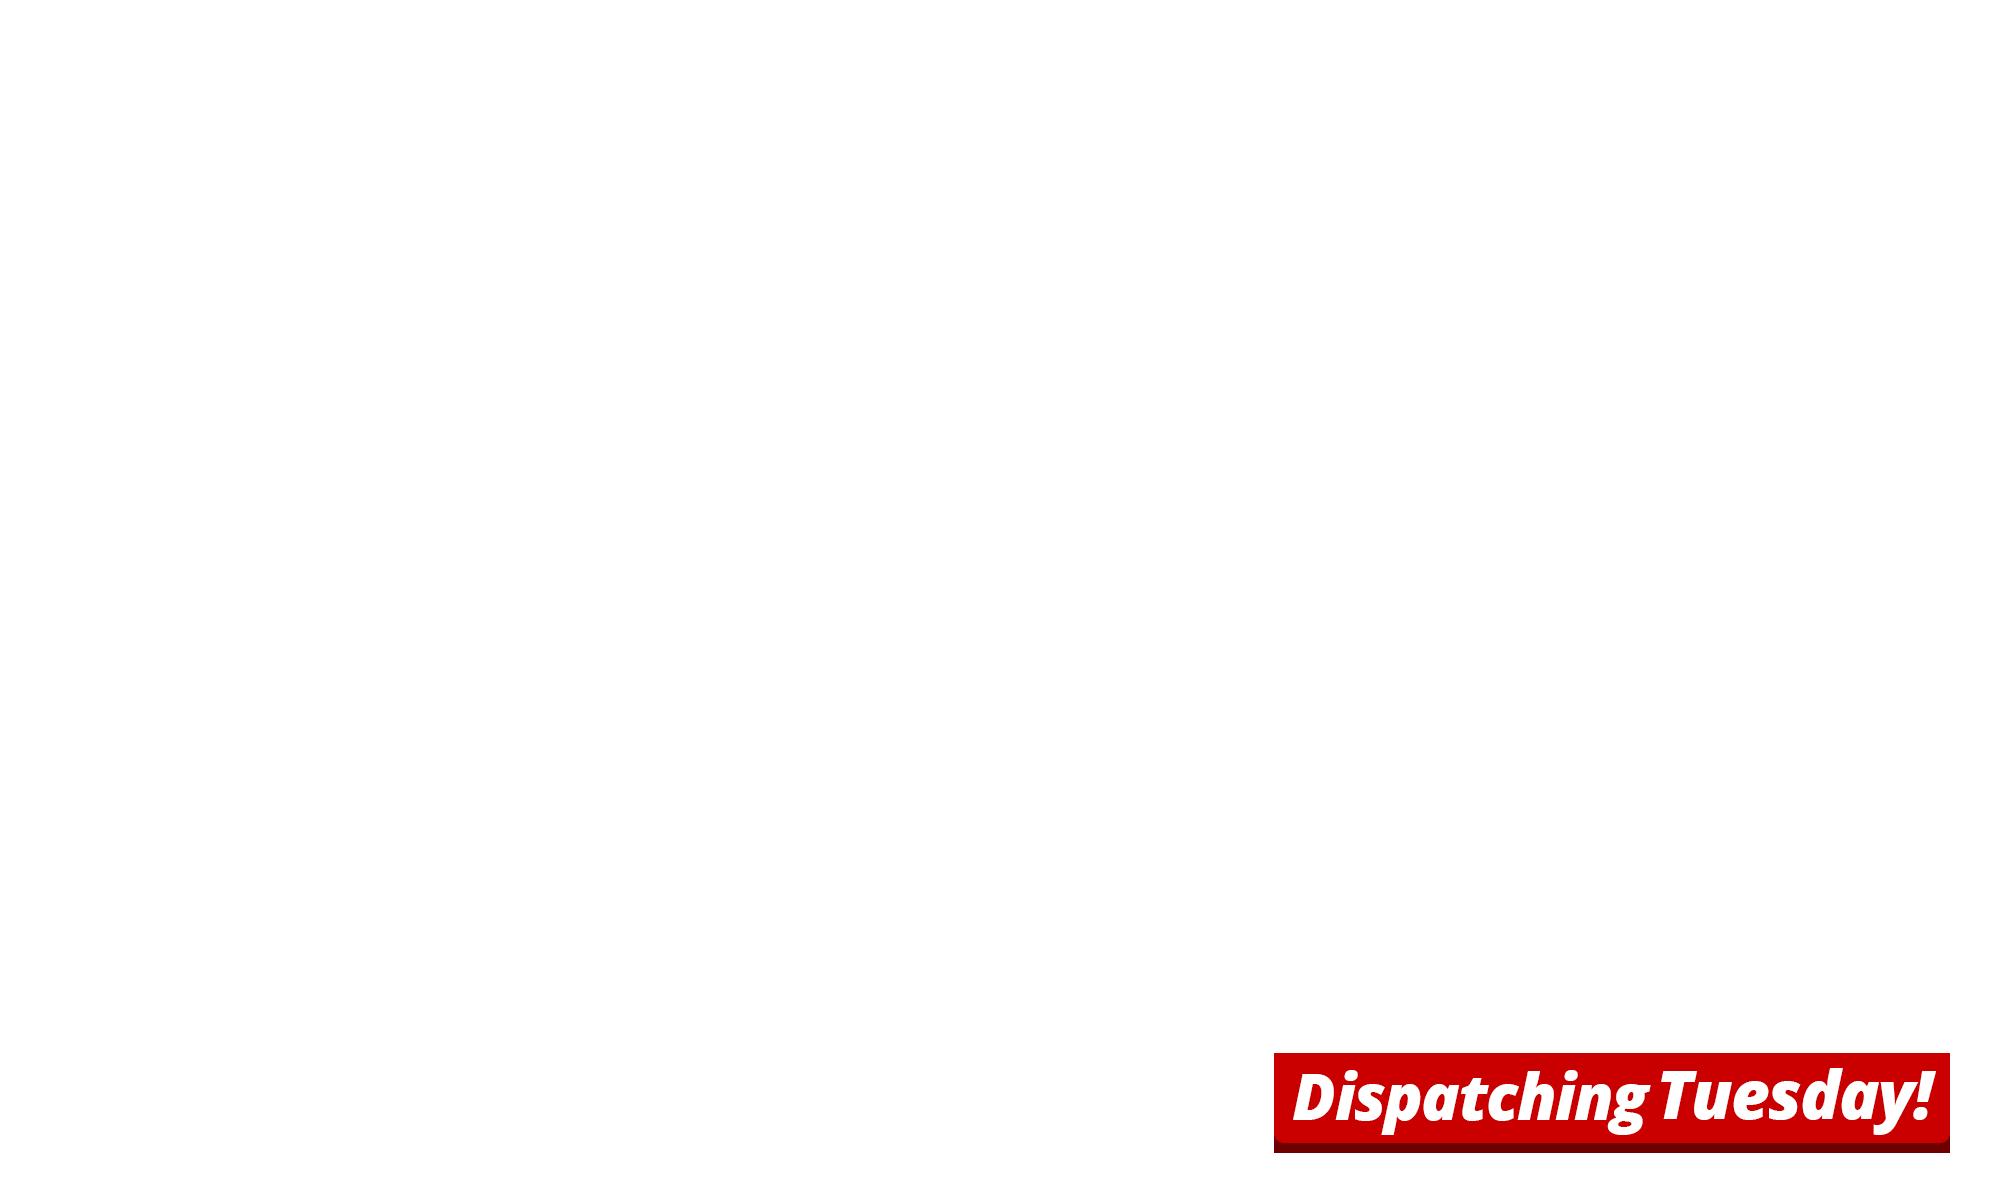 Dispatching tue overlay